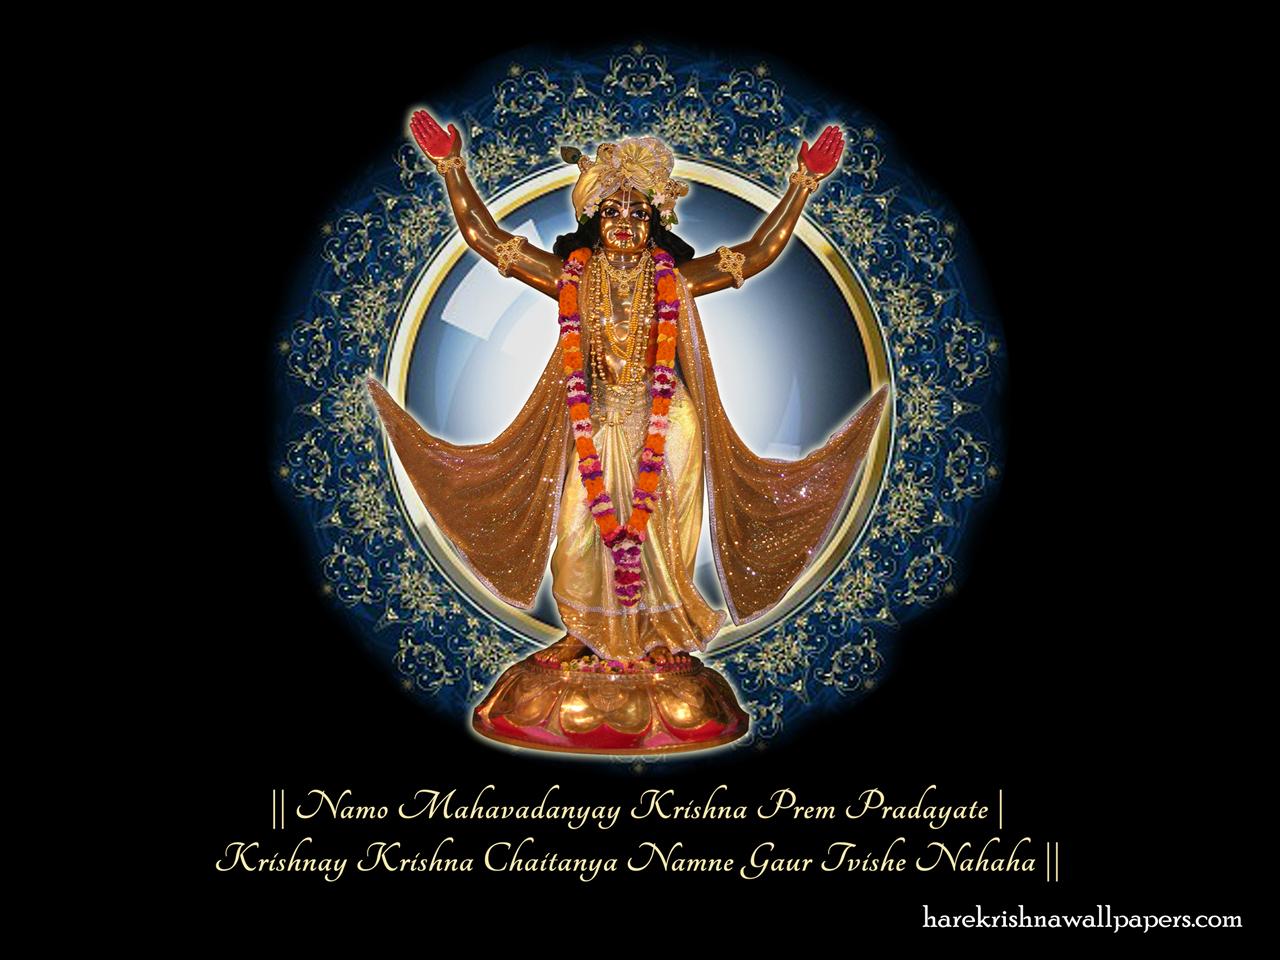 Chaitanya Mahaprabhu Wallpaper (001) Size 1280x960 Download